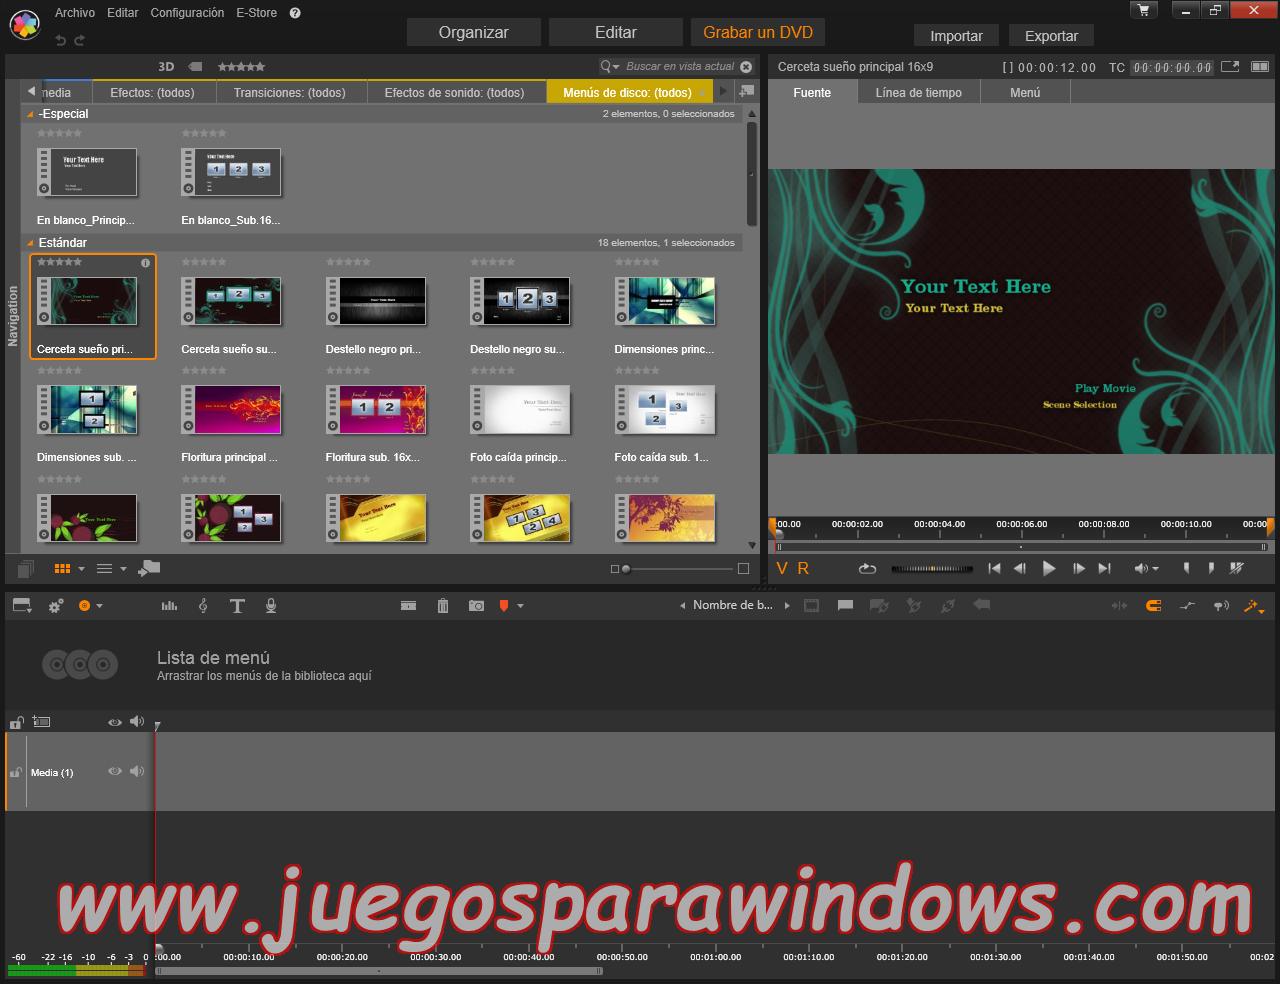 Pinnacle Studio Ultimate v18.0.1 Multilenguaje ESPAÑOL (CORE) 11